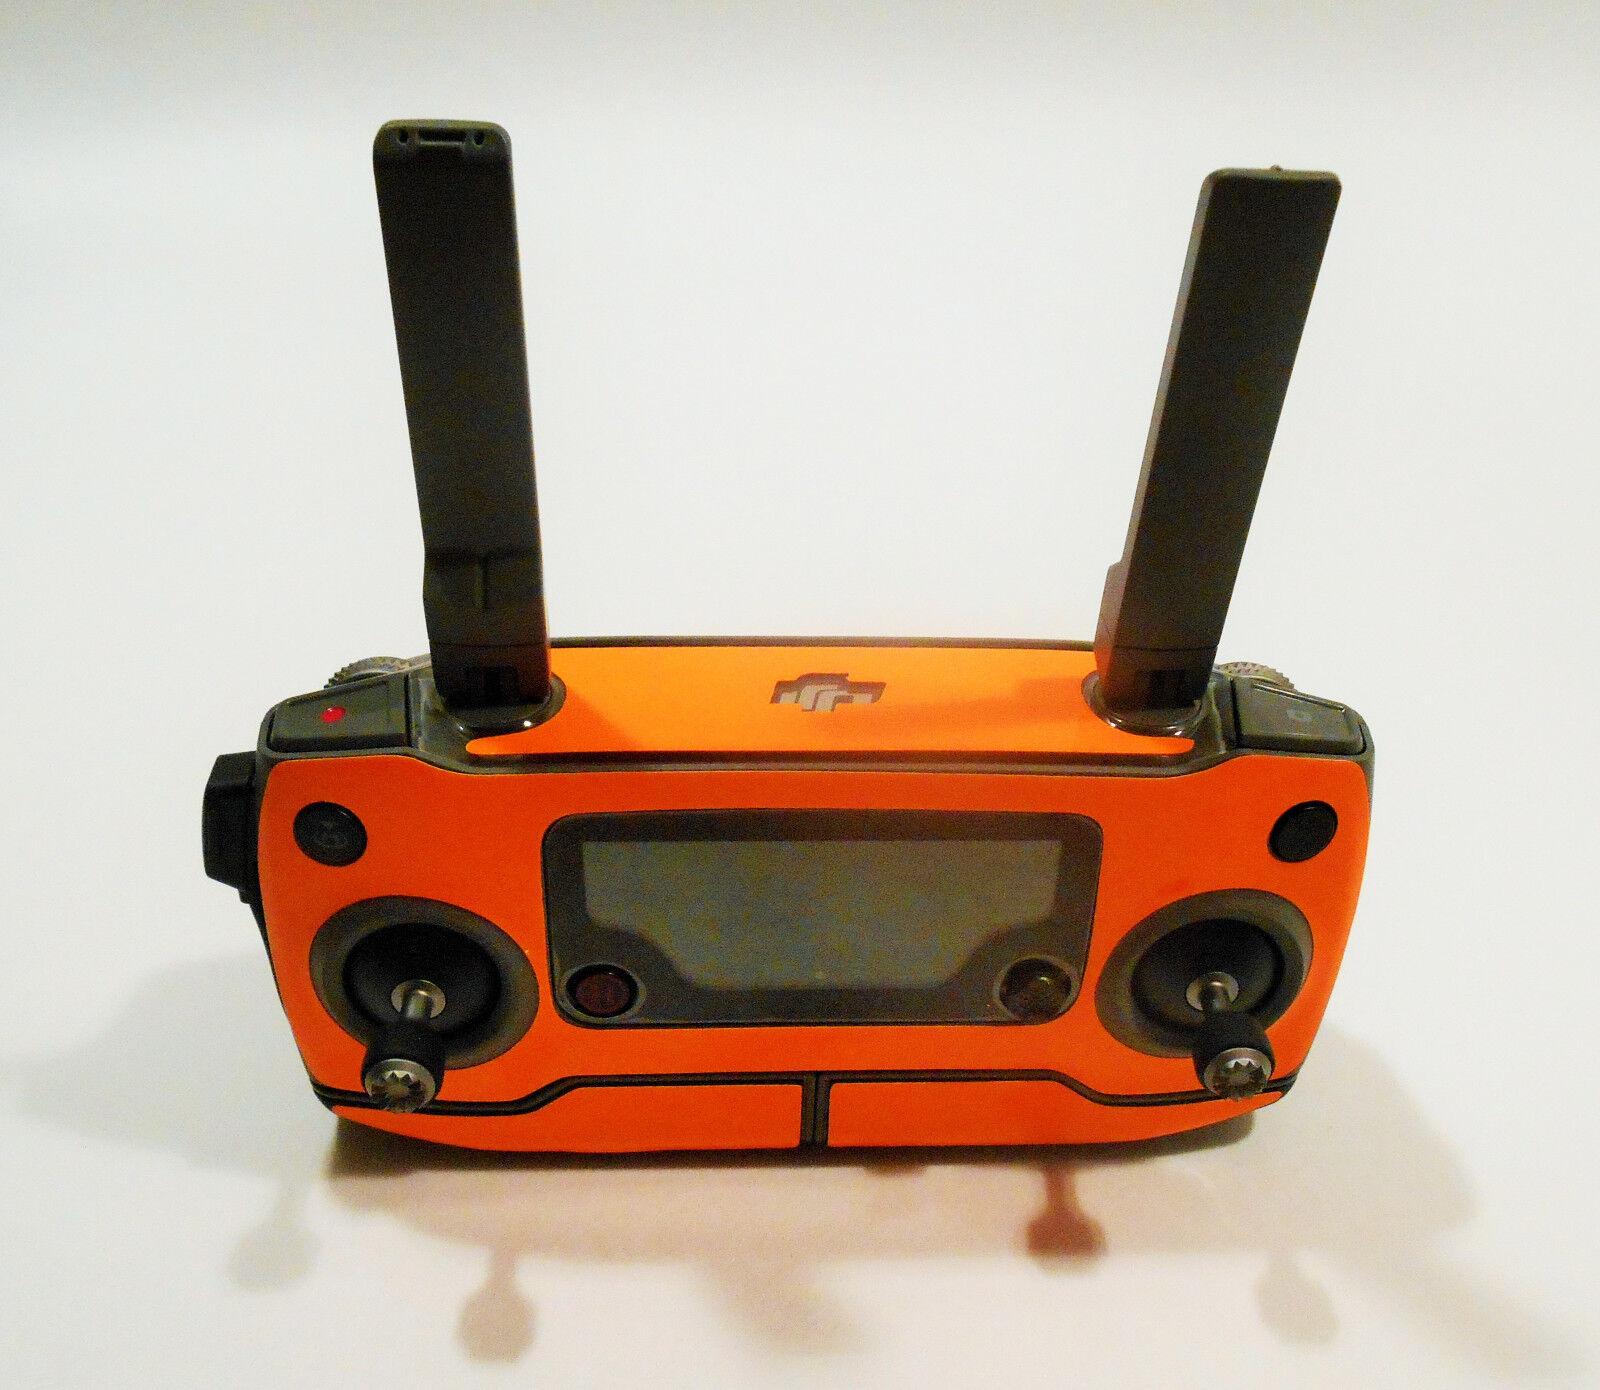 DJI DJI DJI MAVIC 2 PRO ZOOM- SKIN - Neon orange   neon orange - 3-5 Batterien   Drohne 27d504